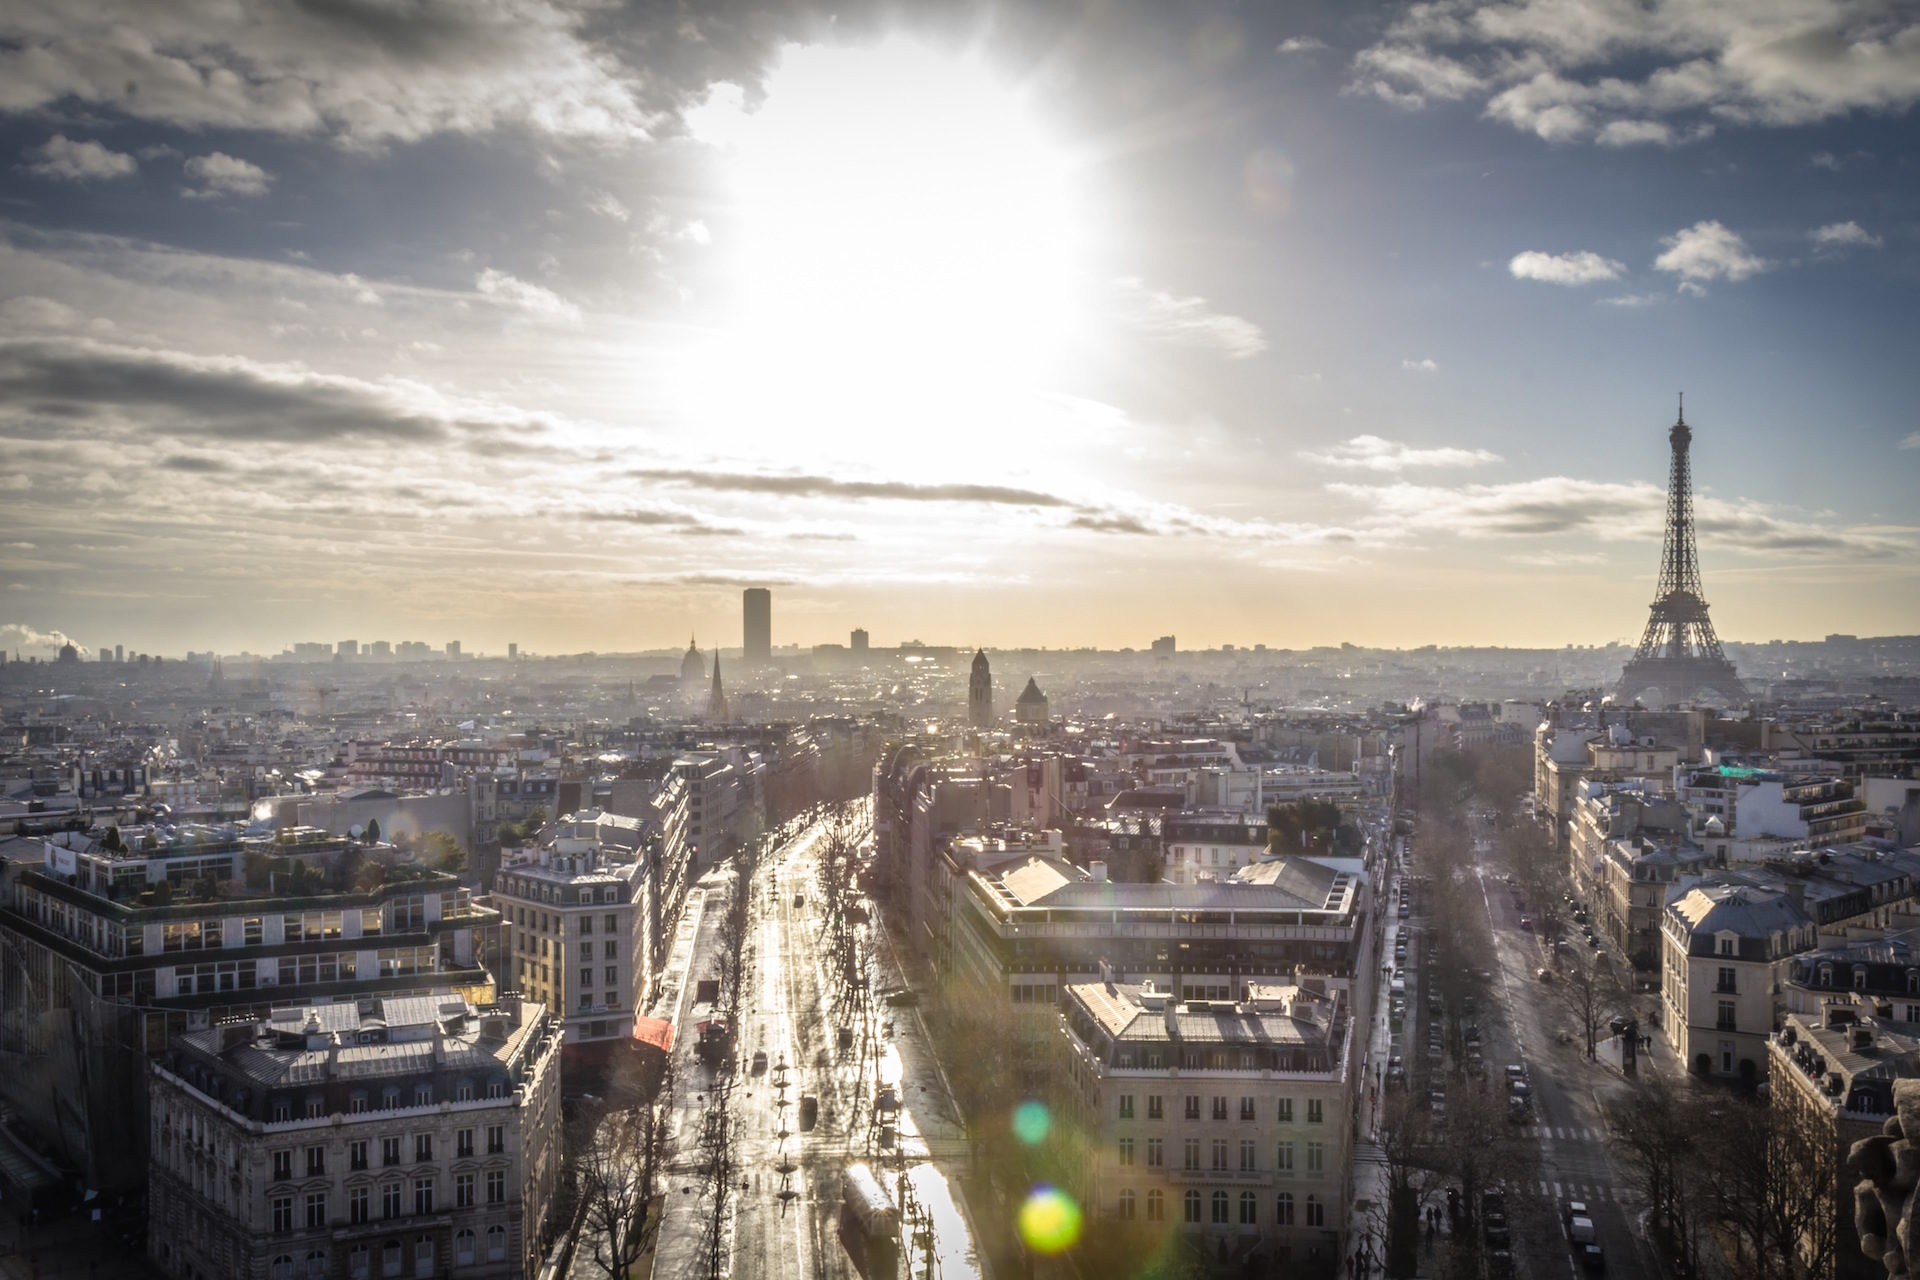 पेरिस, फ़्रांस, टॉवर, एफिल, सूर्य - HD वॉलपेपर - प्रोफेसर-falken.com